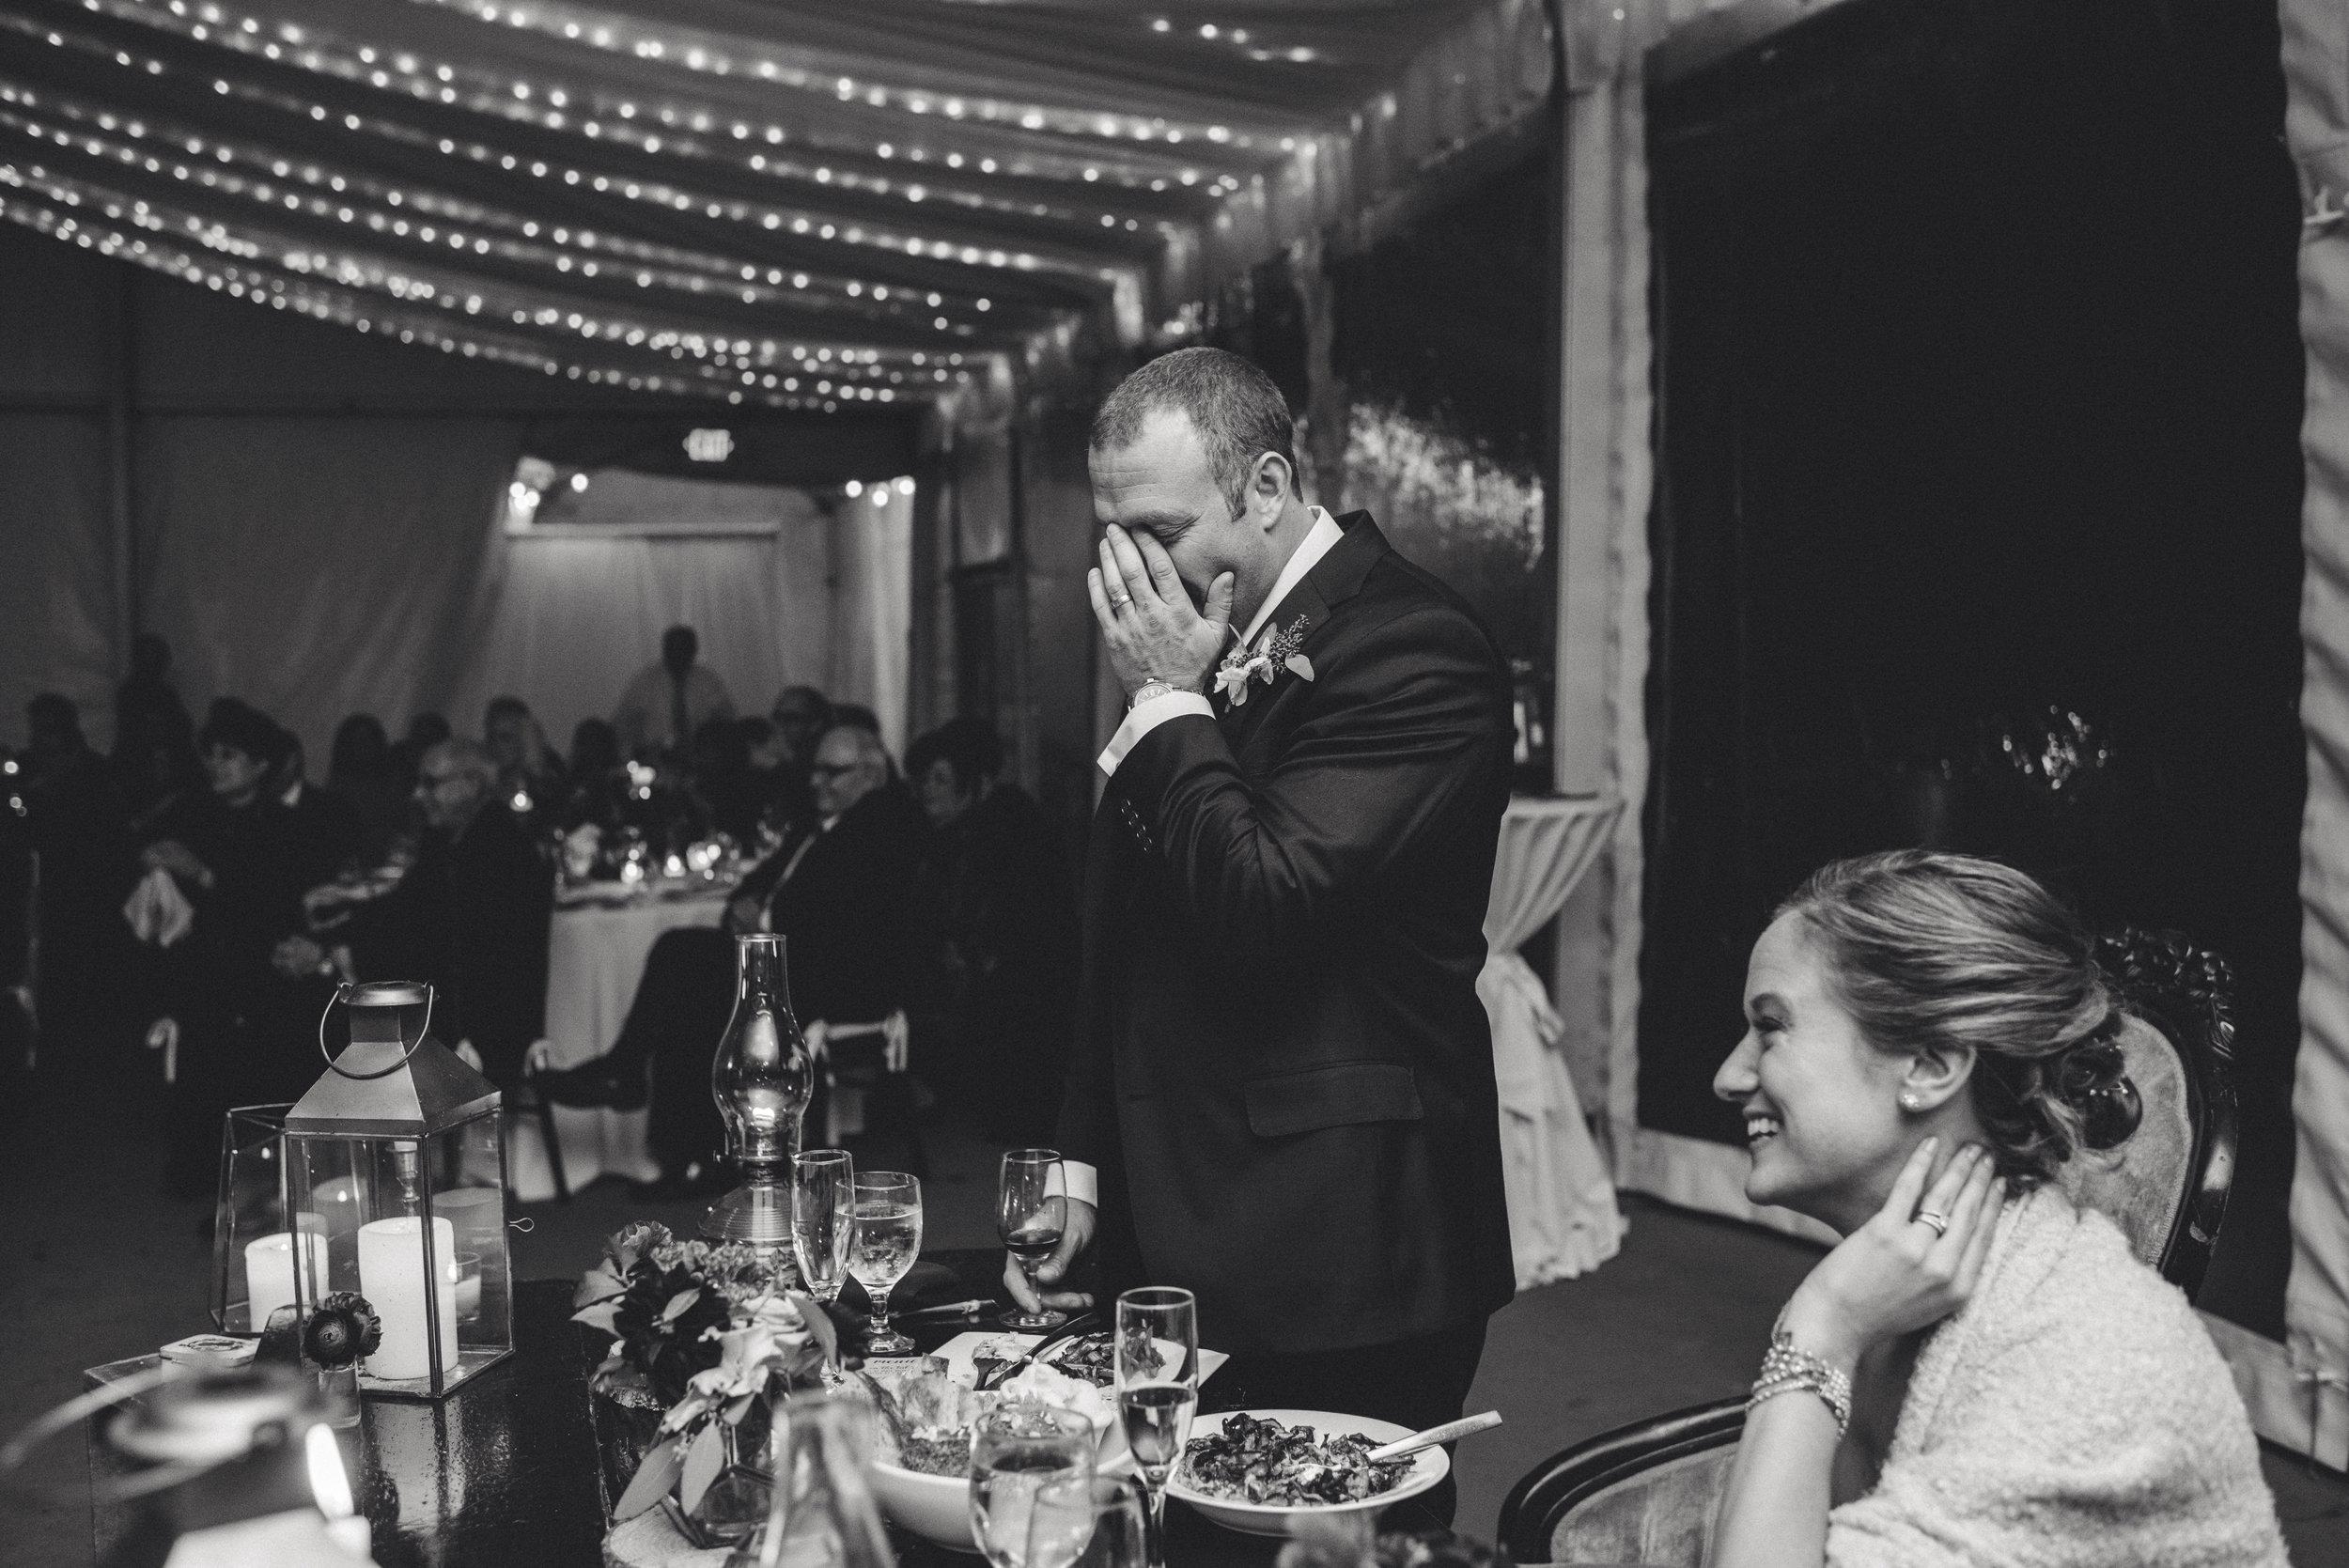 JACQUELINE & ANDREW WARSHAWER -BROOKMILL FARM FALL WEDDING - INTIMATE WEDDING PHOTOGRAPHER - TWOTWENTY by CHI-CHI AGBIM-630.jpg